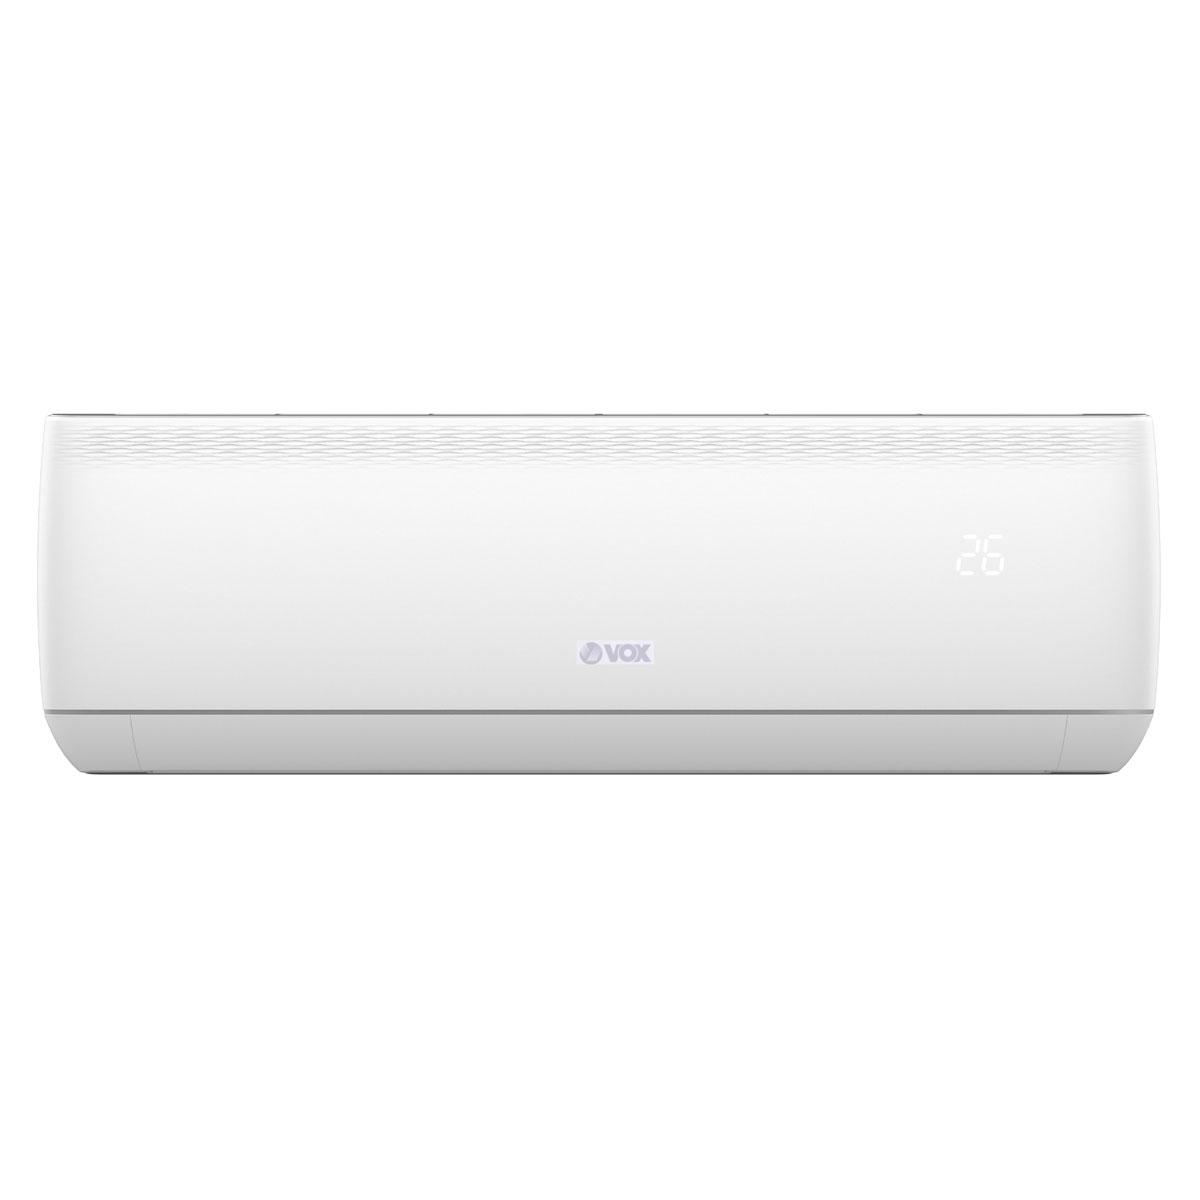 VOX klima uređaj inverter IVA5-24JR - Inelektronik